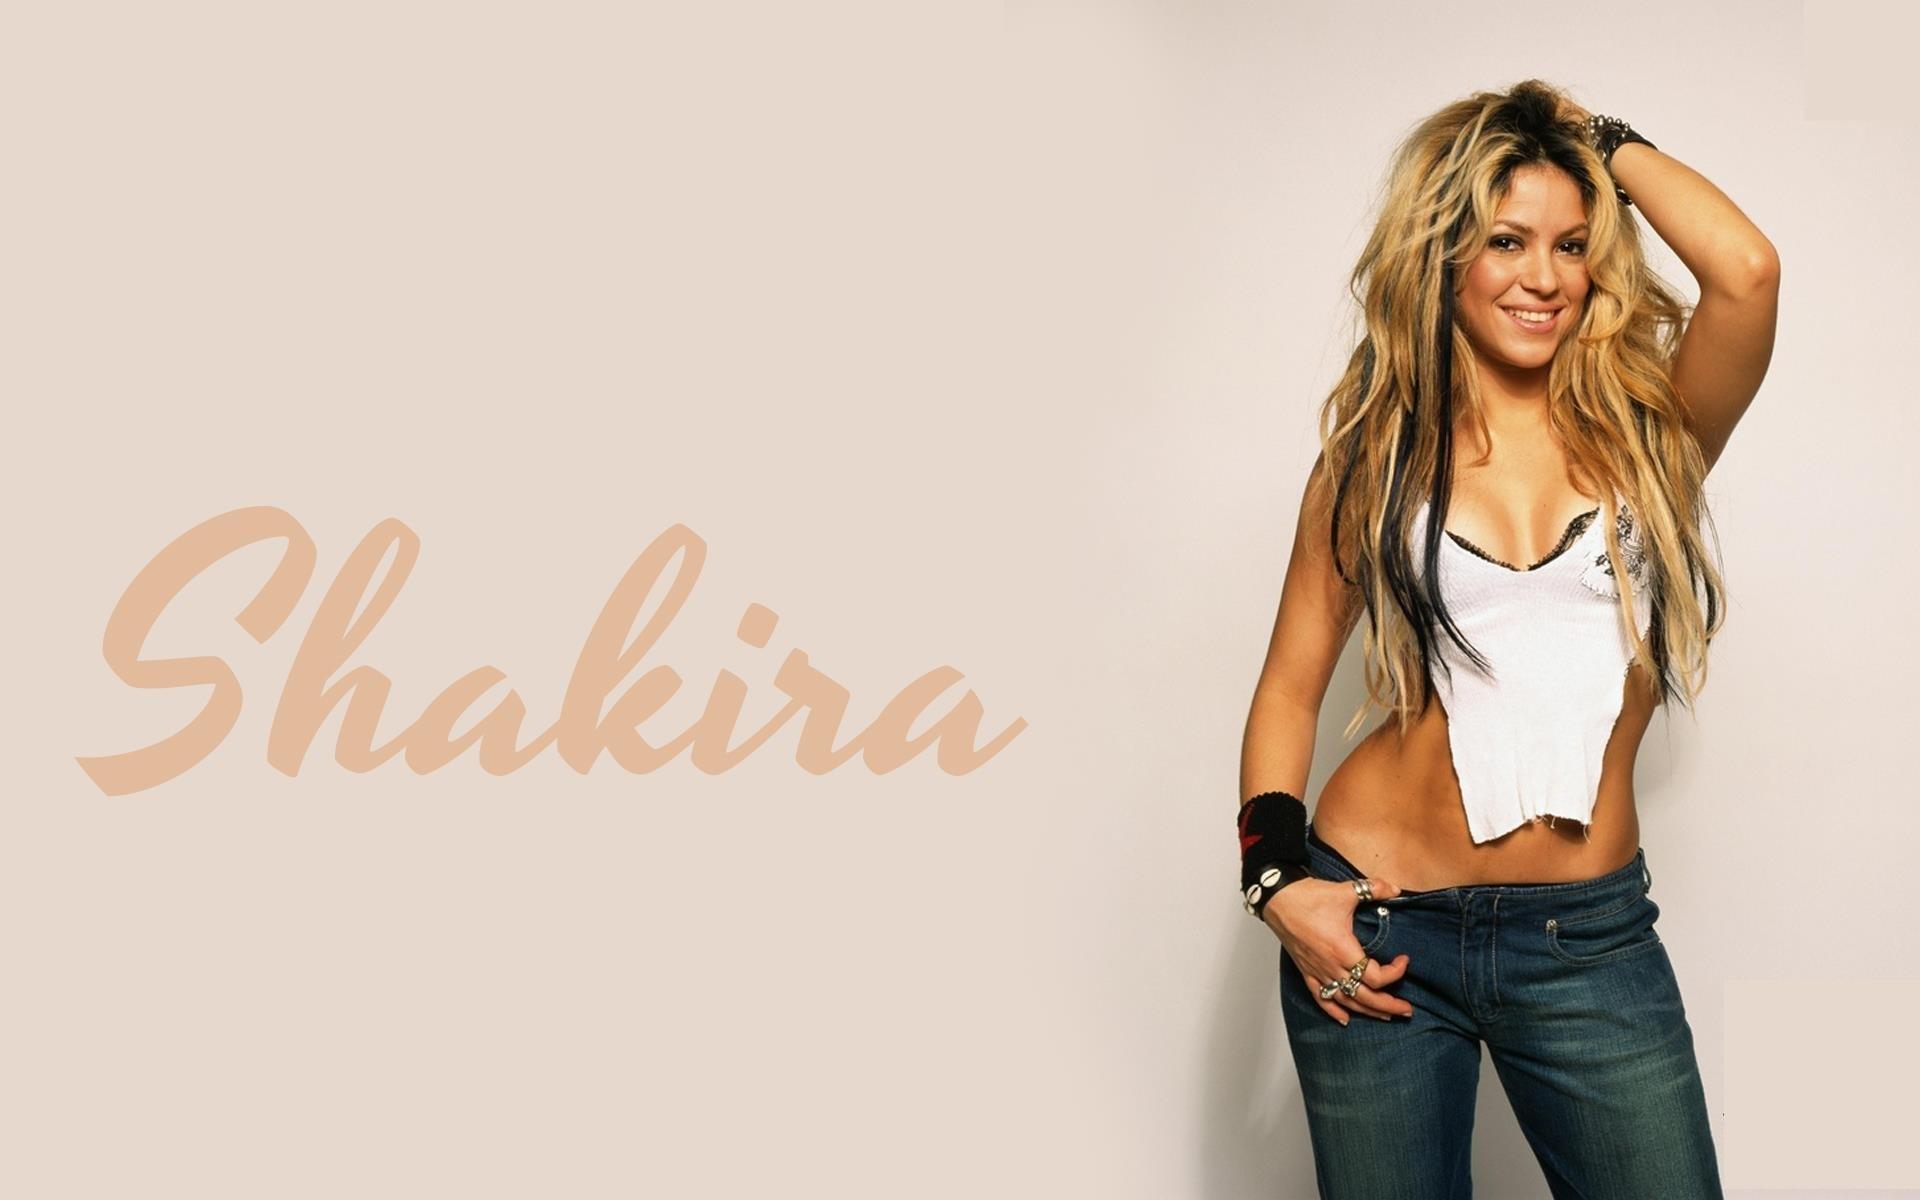 Shakira Hot And Sexy Leaked Photoshoot-8566